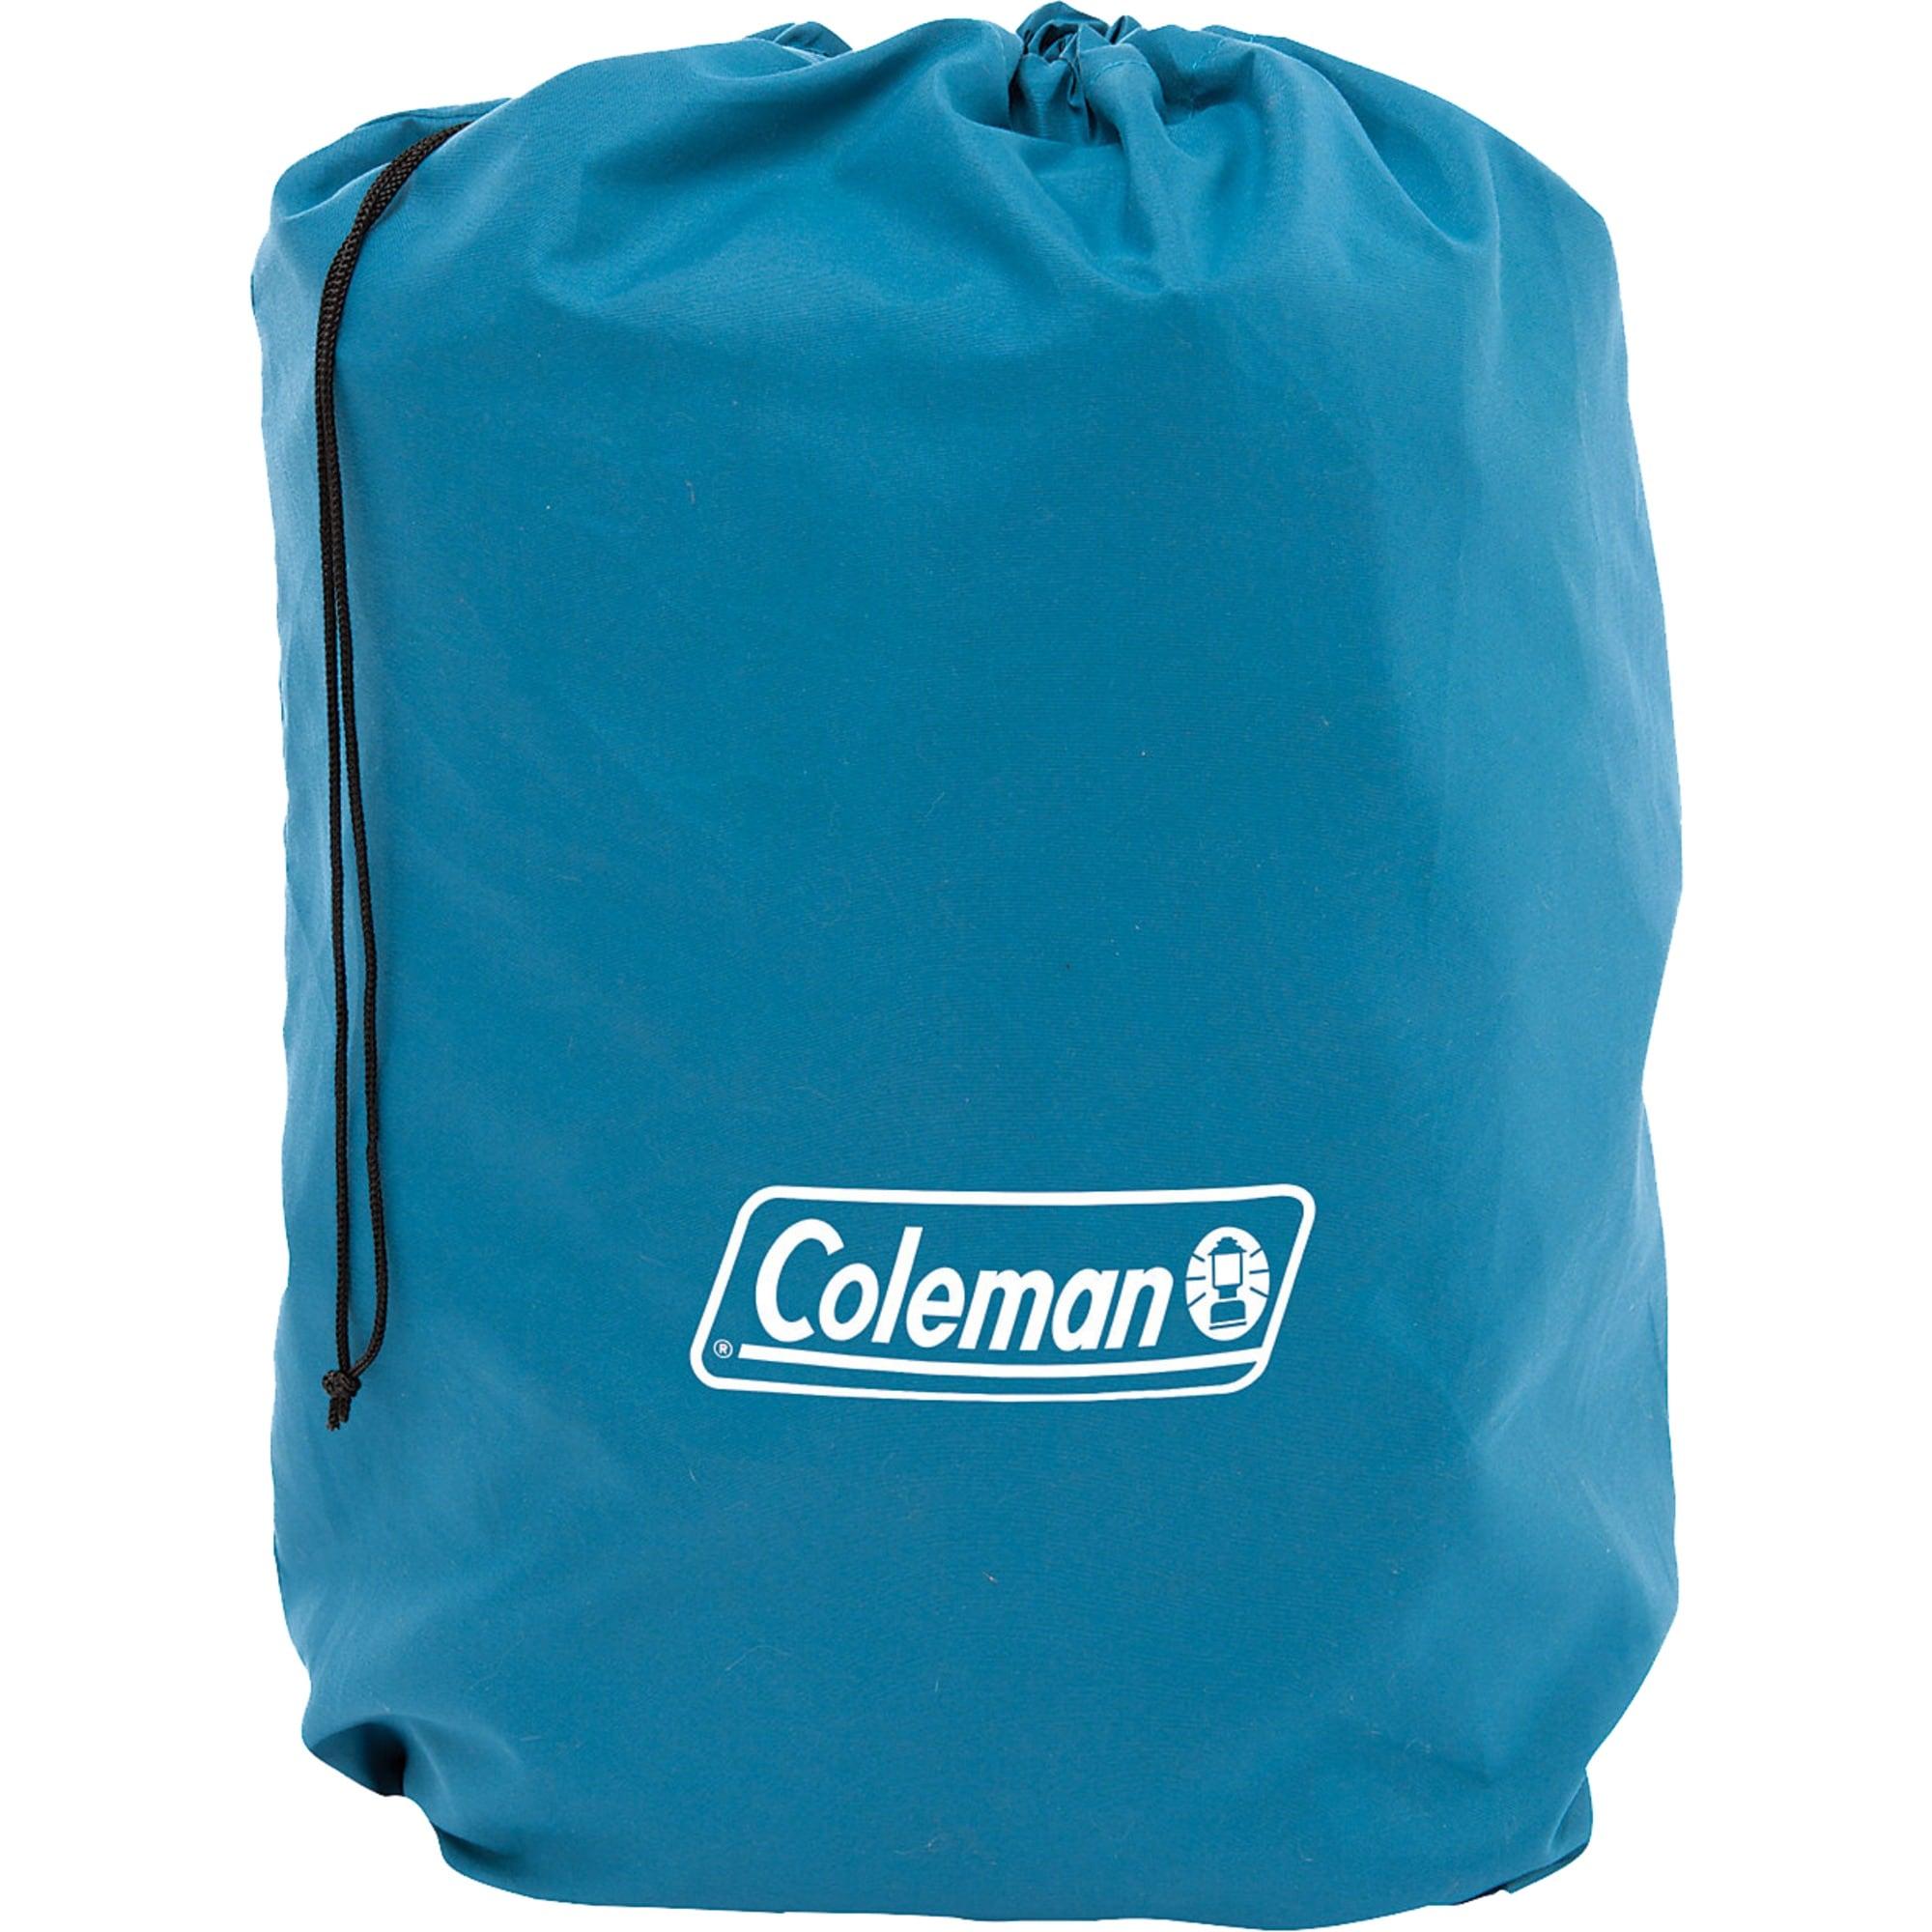 Coleman Luftbett Extra Durable